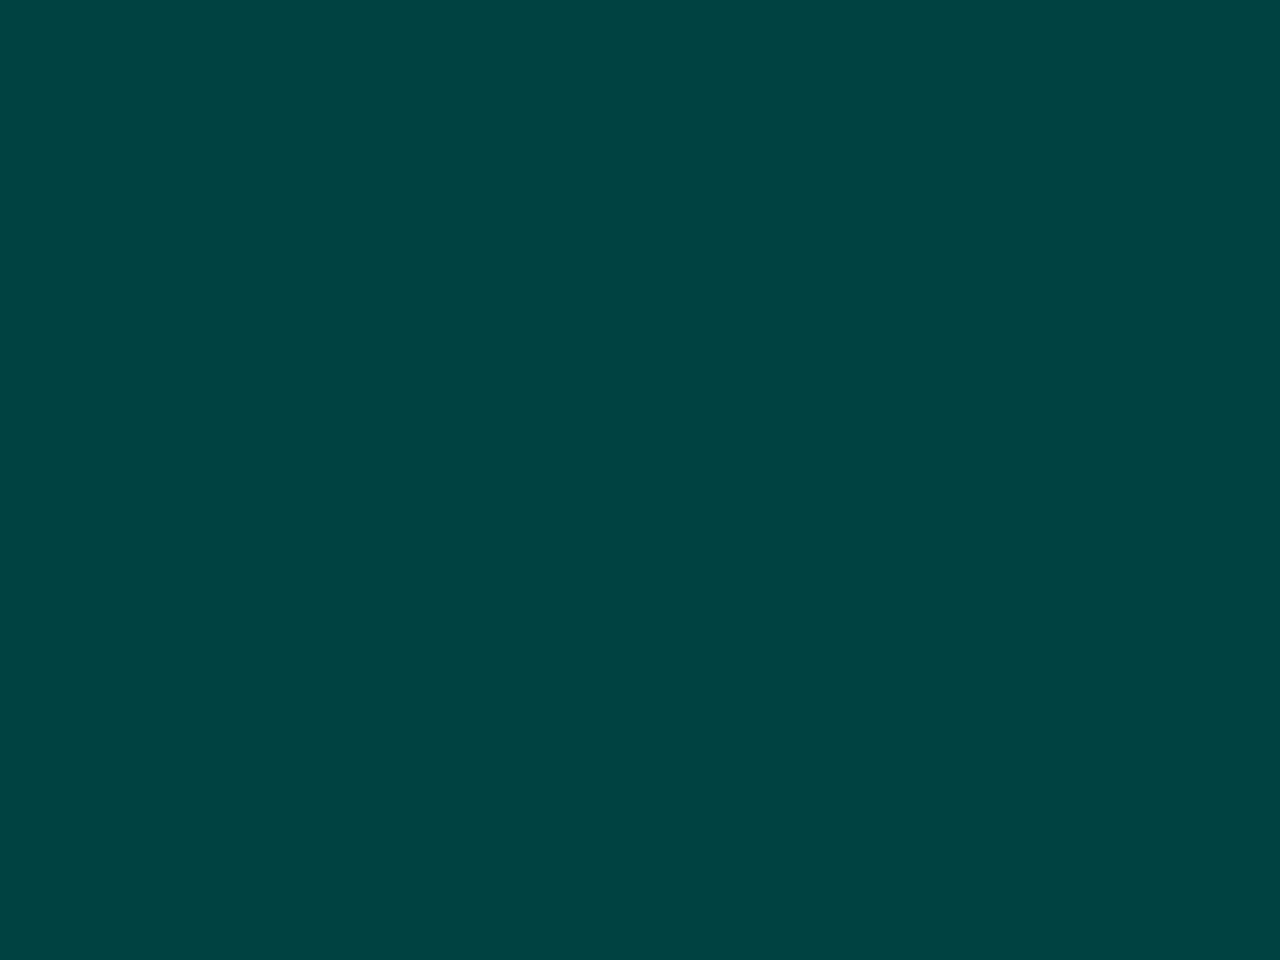 1280x960 Warm Black Solid Color Background